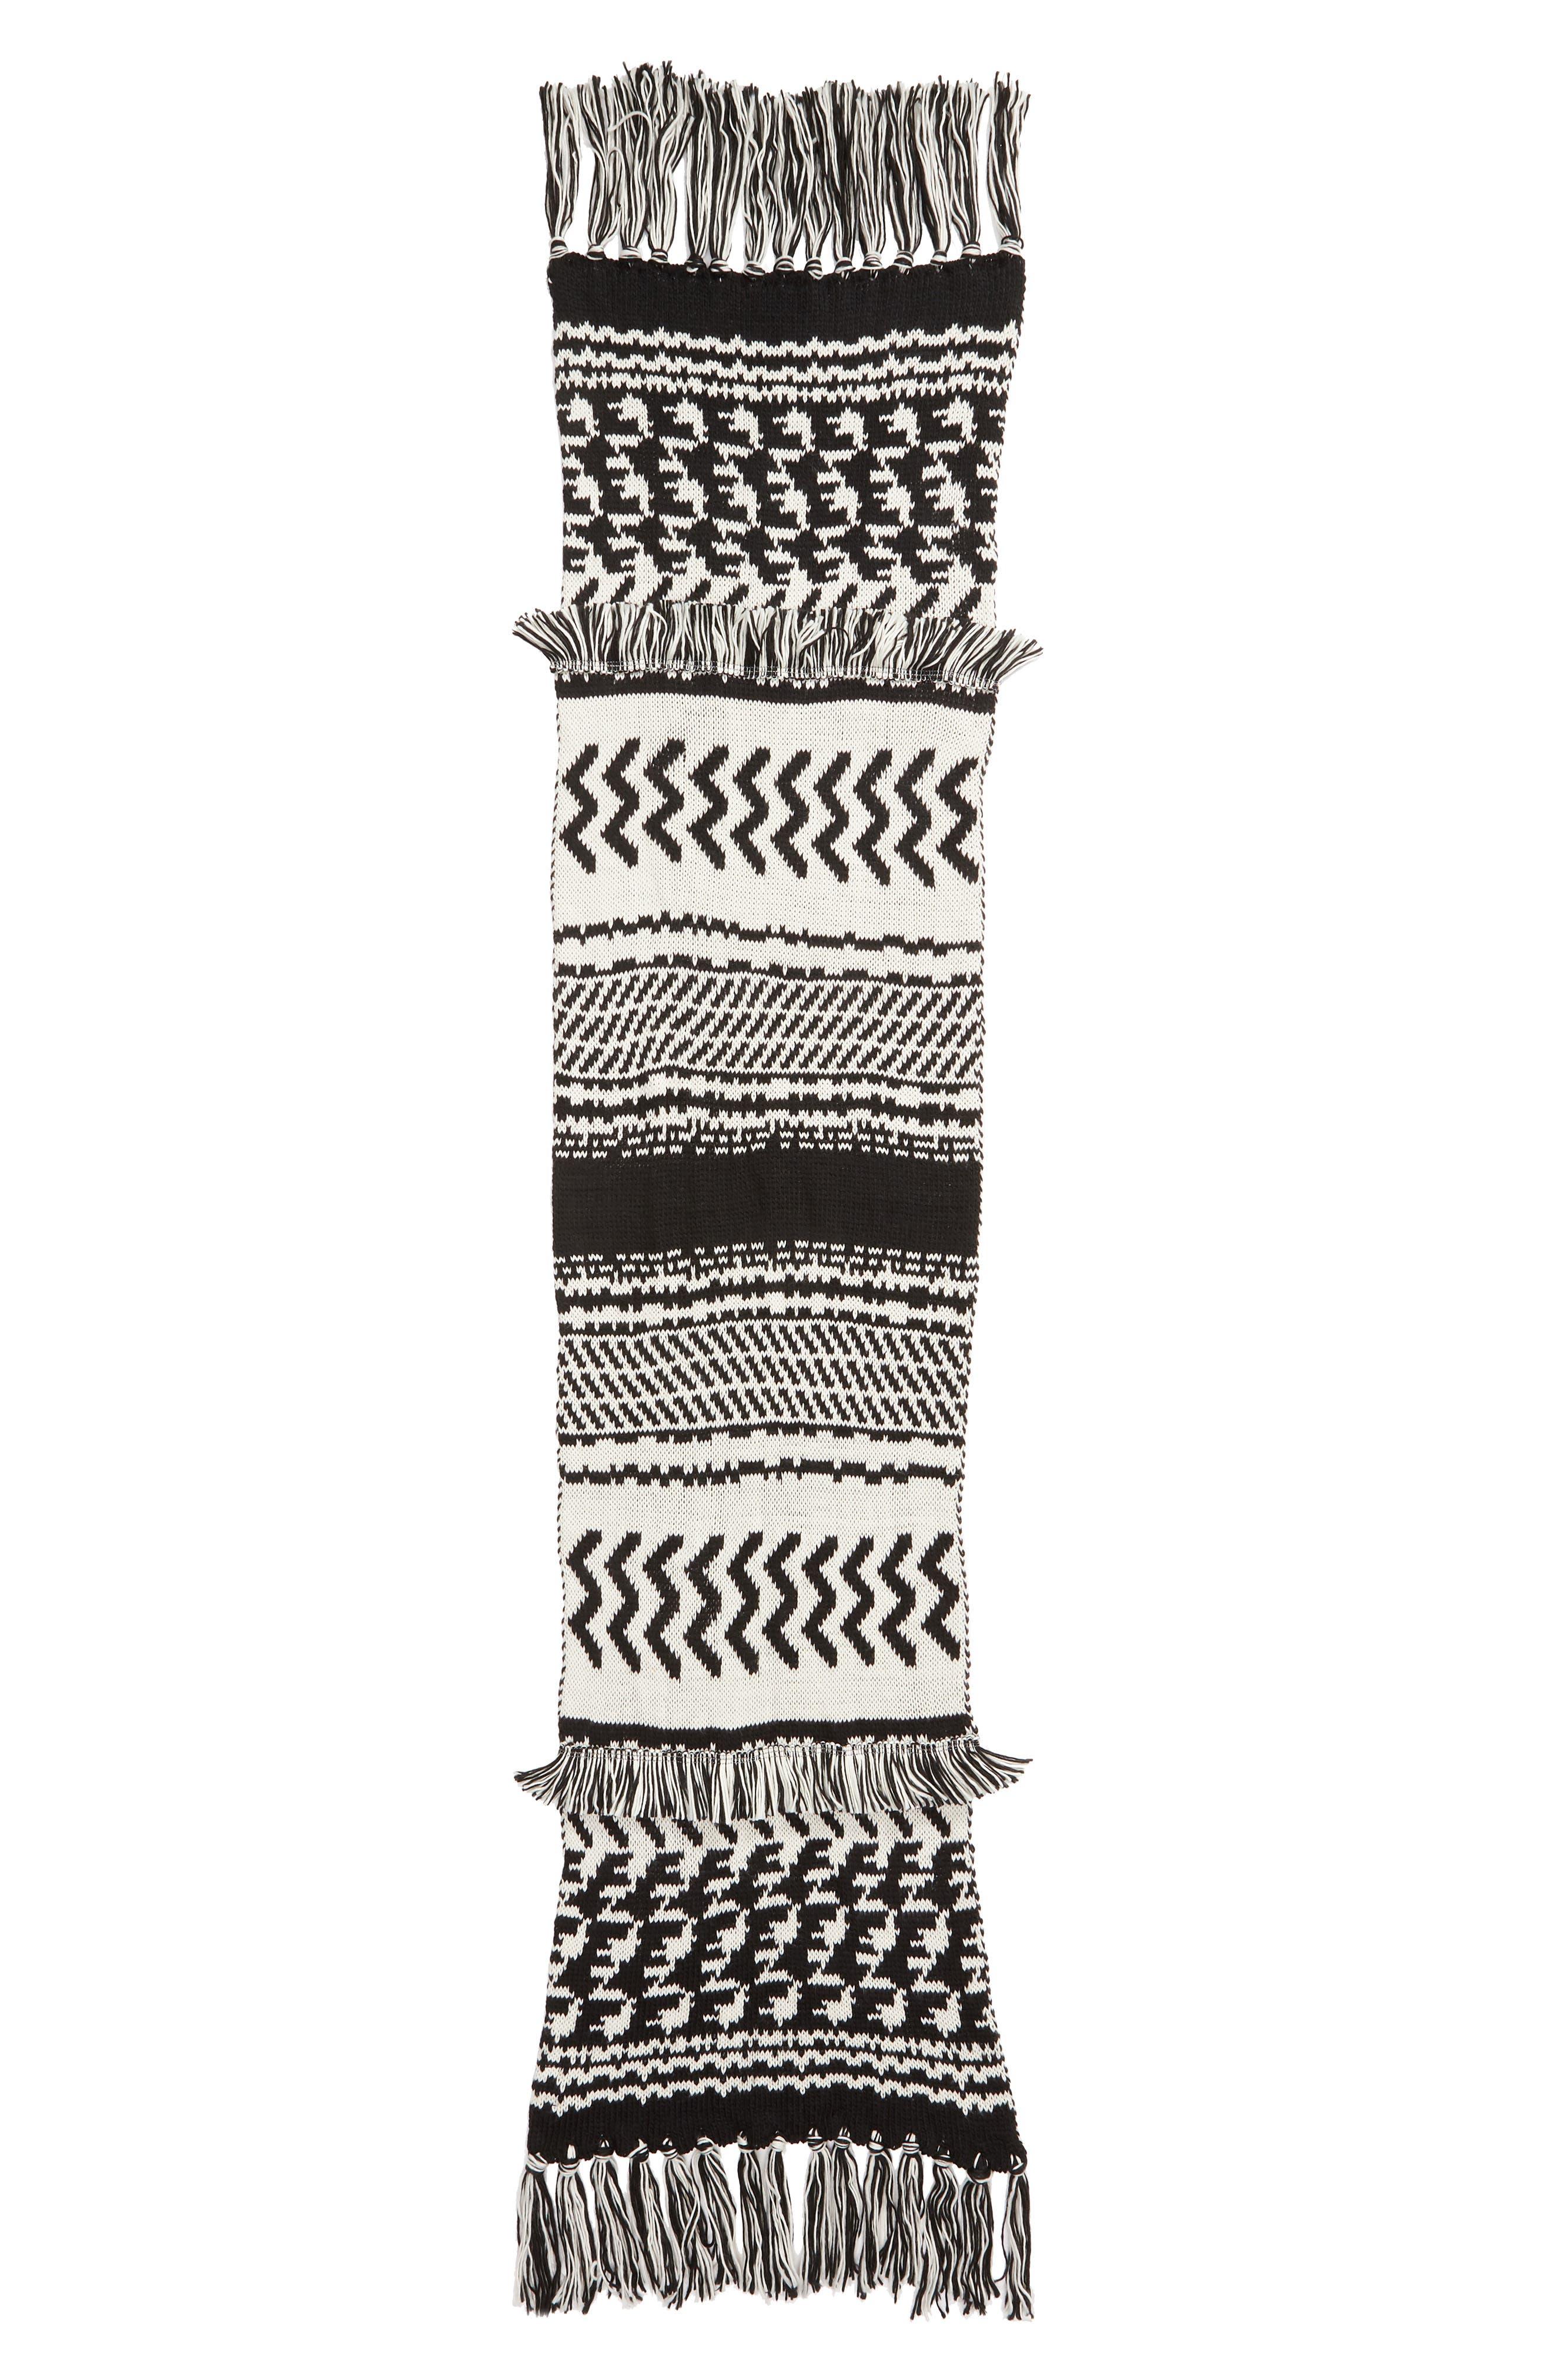 Mile High Fleece Fringe Scarf,                             Alternate thumbnail 3, color,                             BLACK AND WHITE COMBO